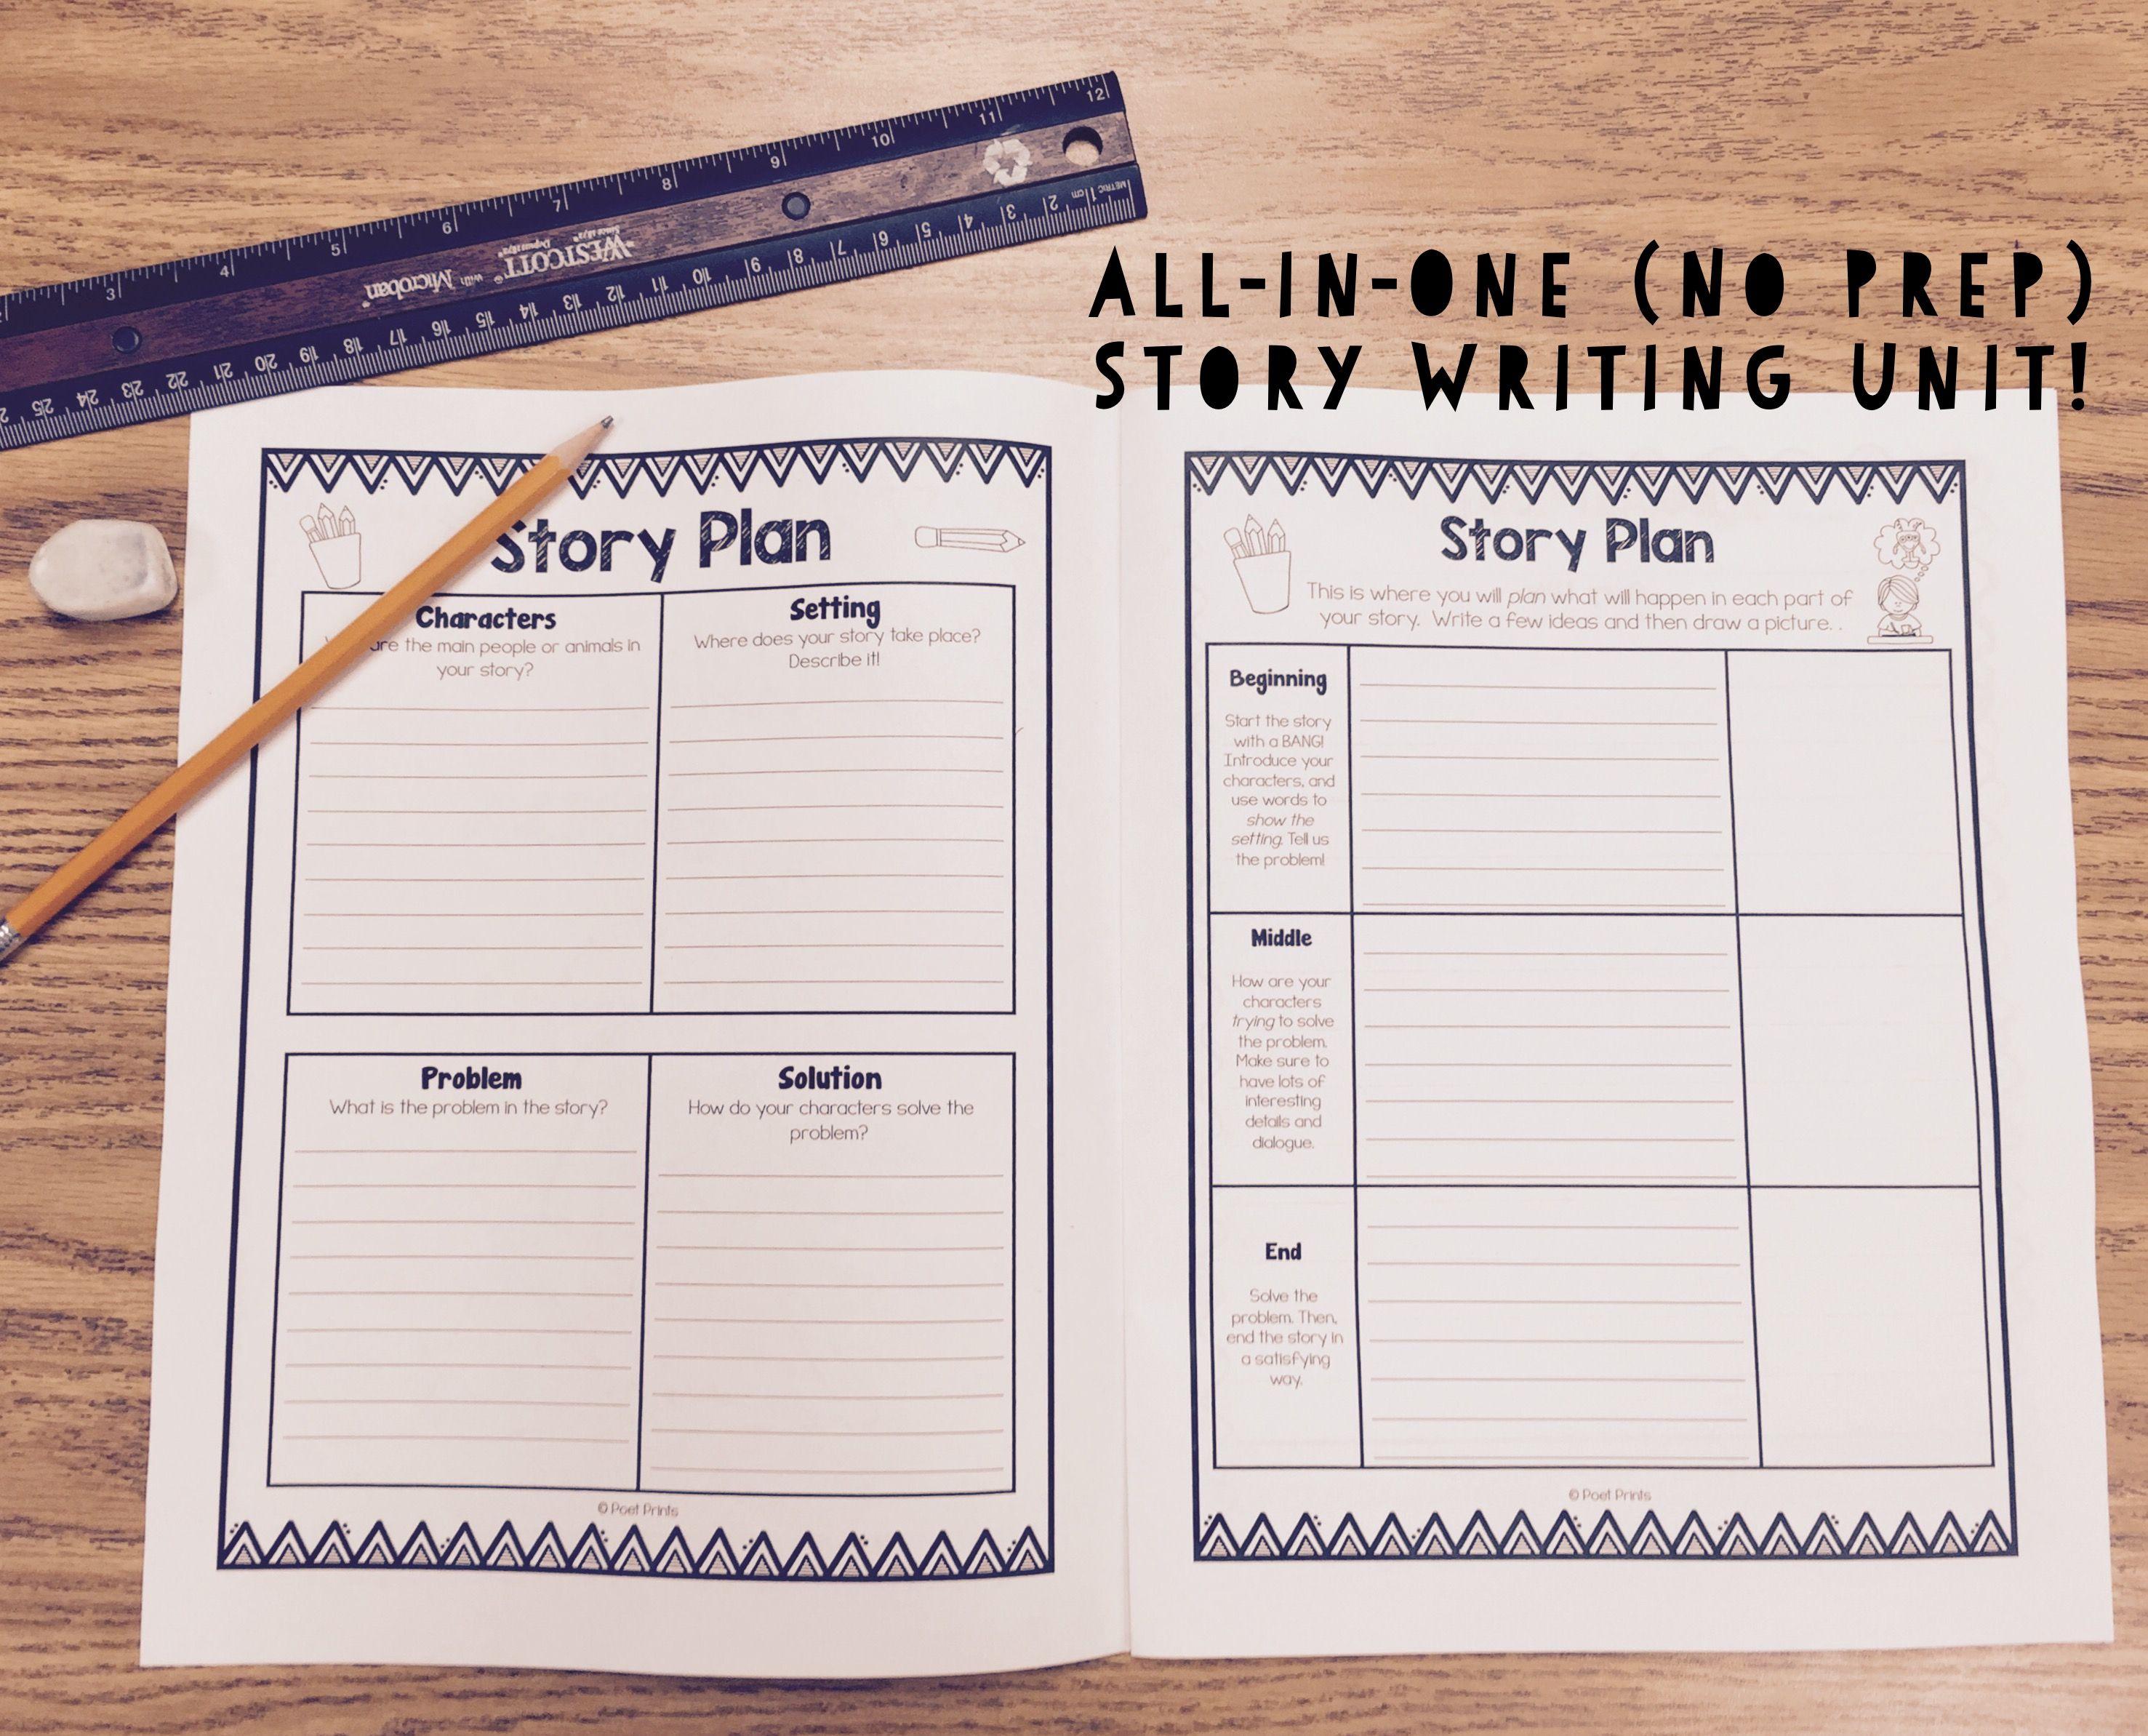 Creative Story Writing Narrative Pack